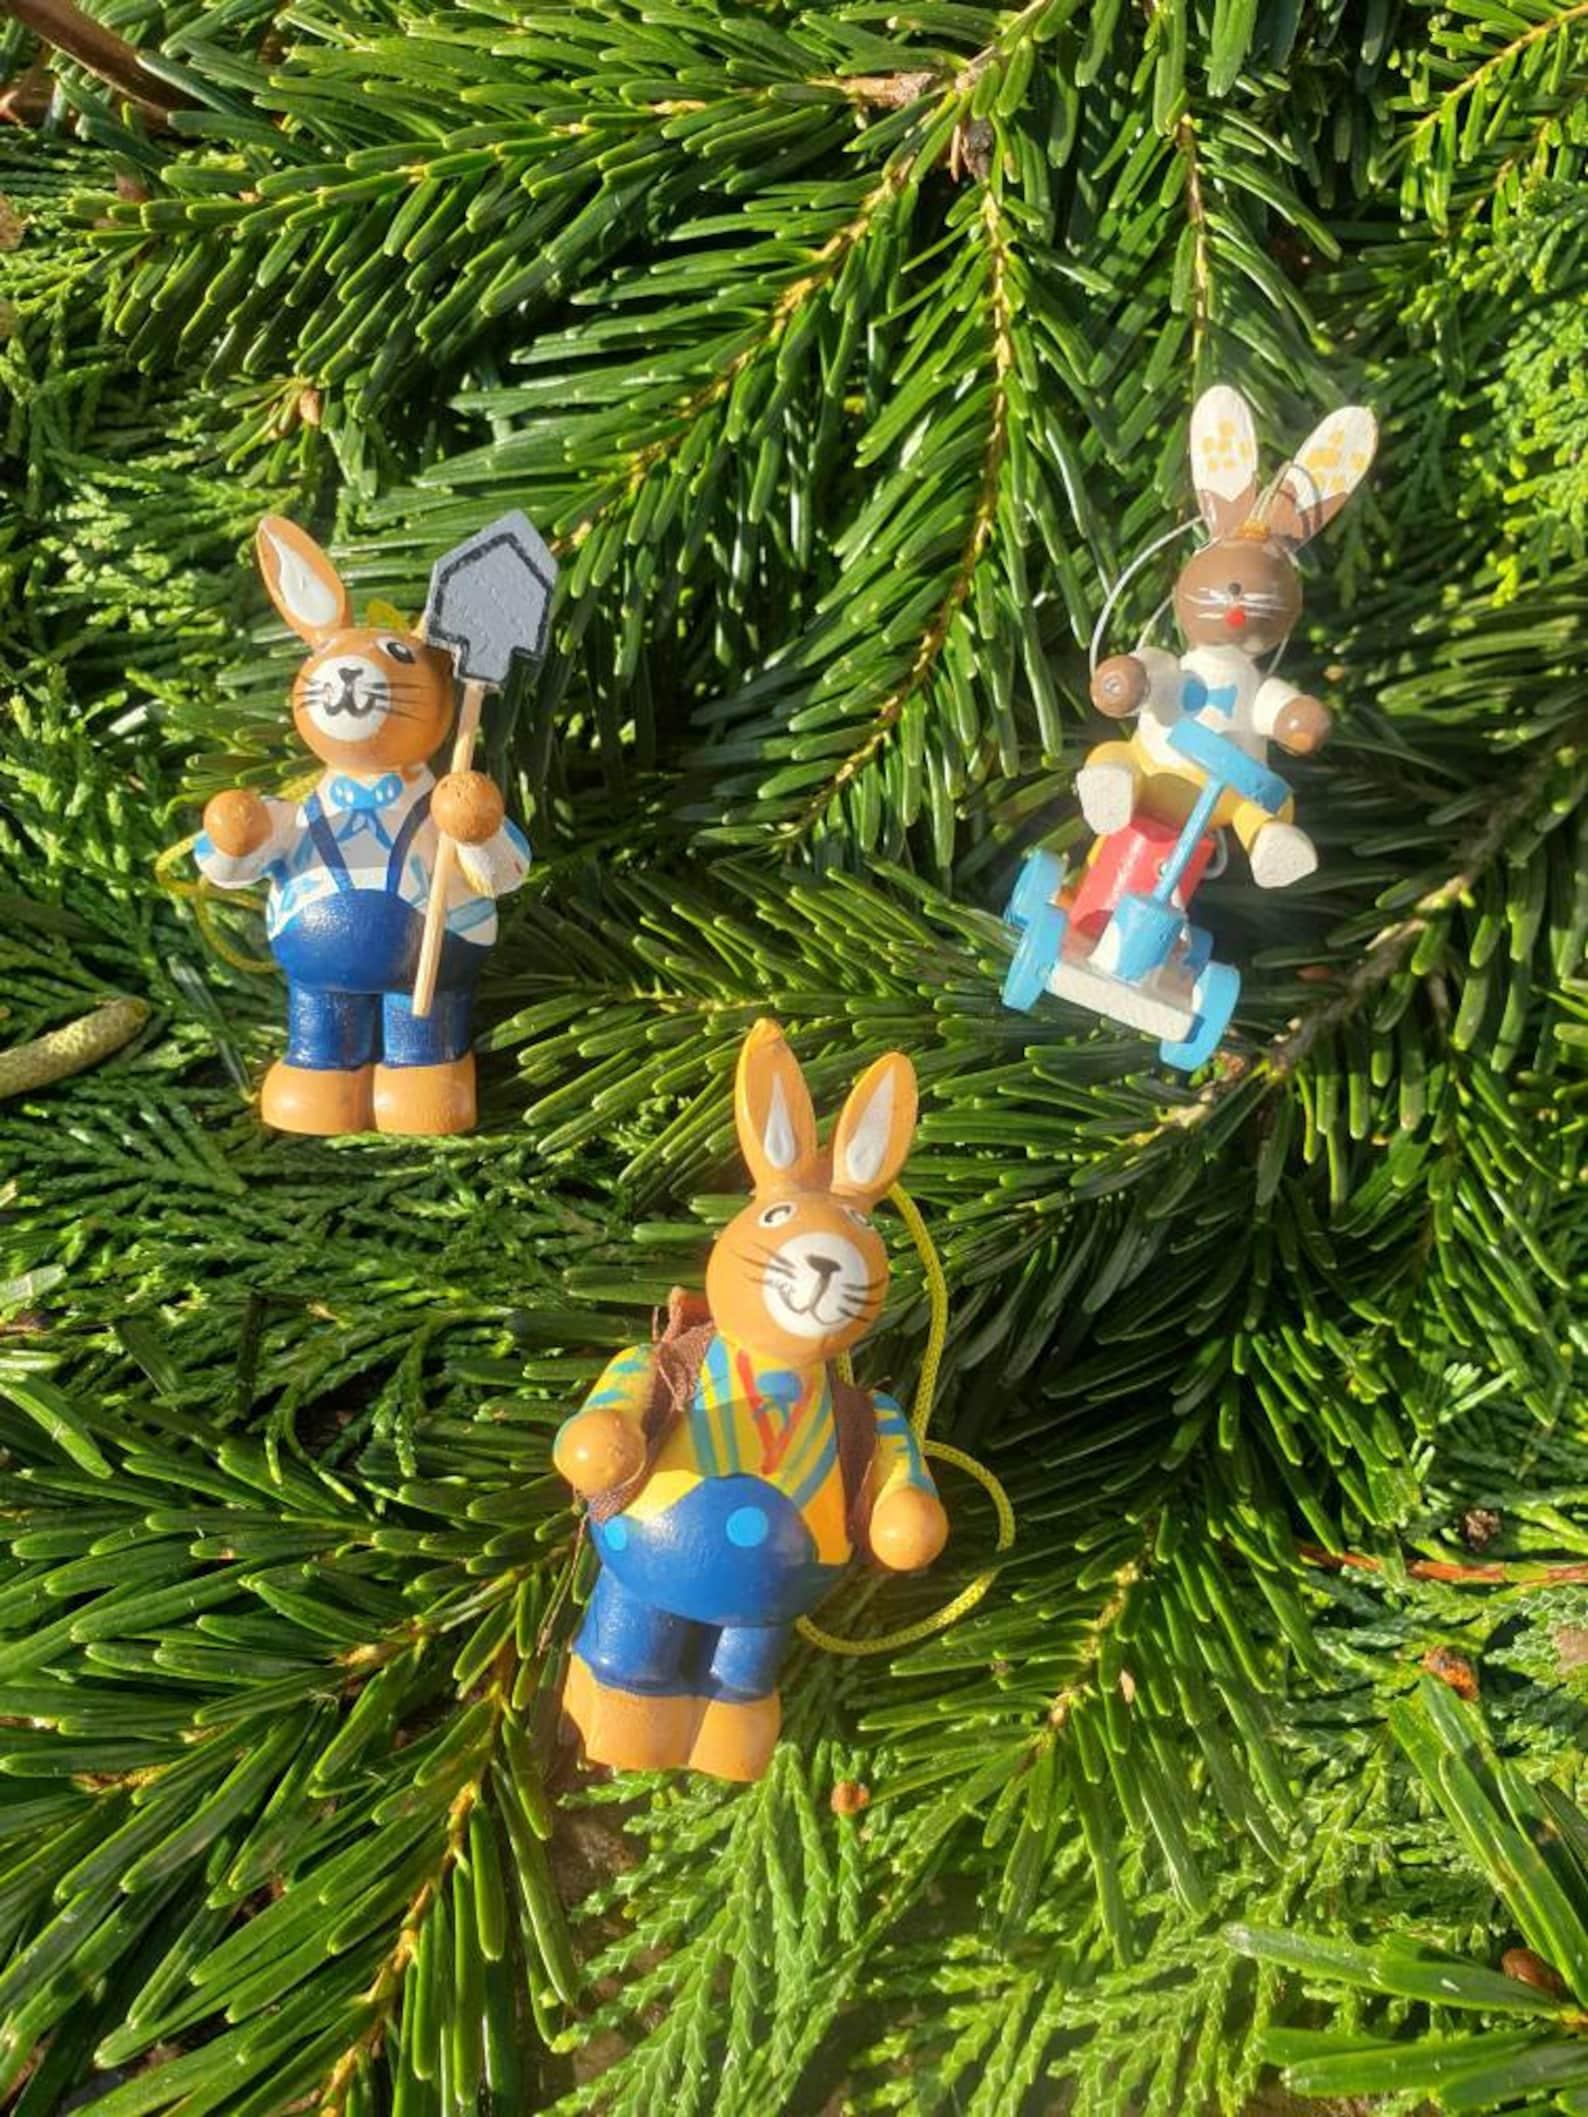 Busy Bunnies Erzgebirge Folk Art Vintage German Handmade Wooden Rabbit Easter Decor